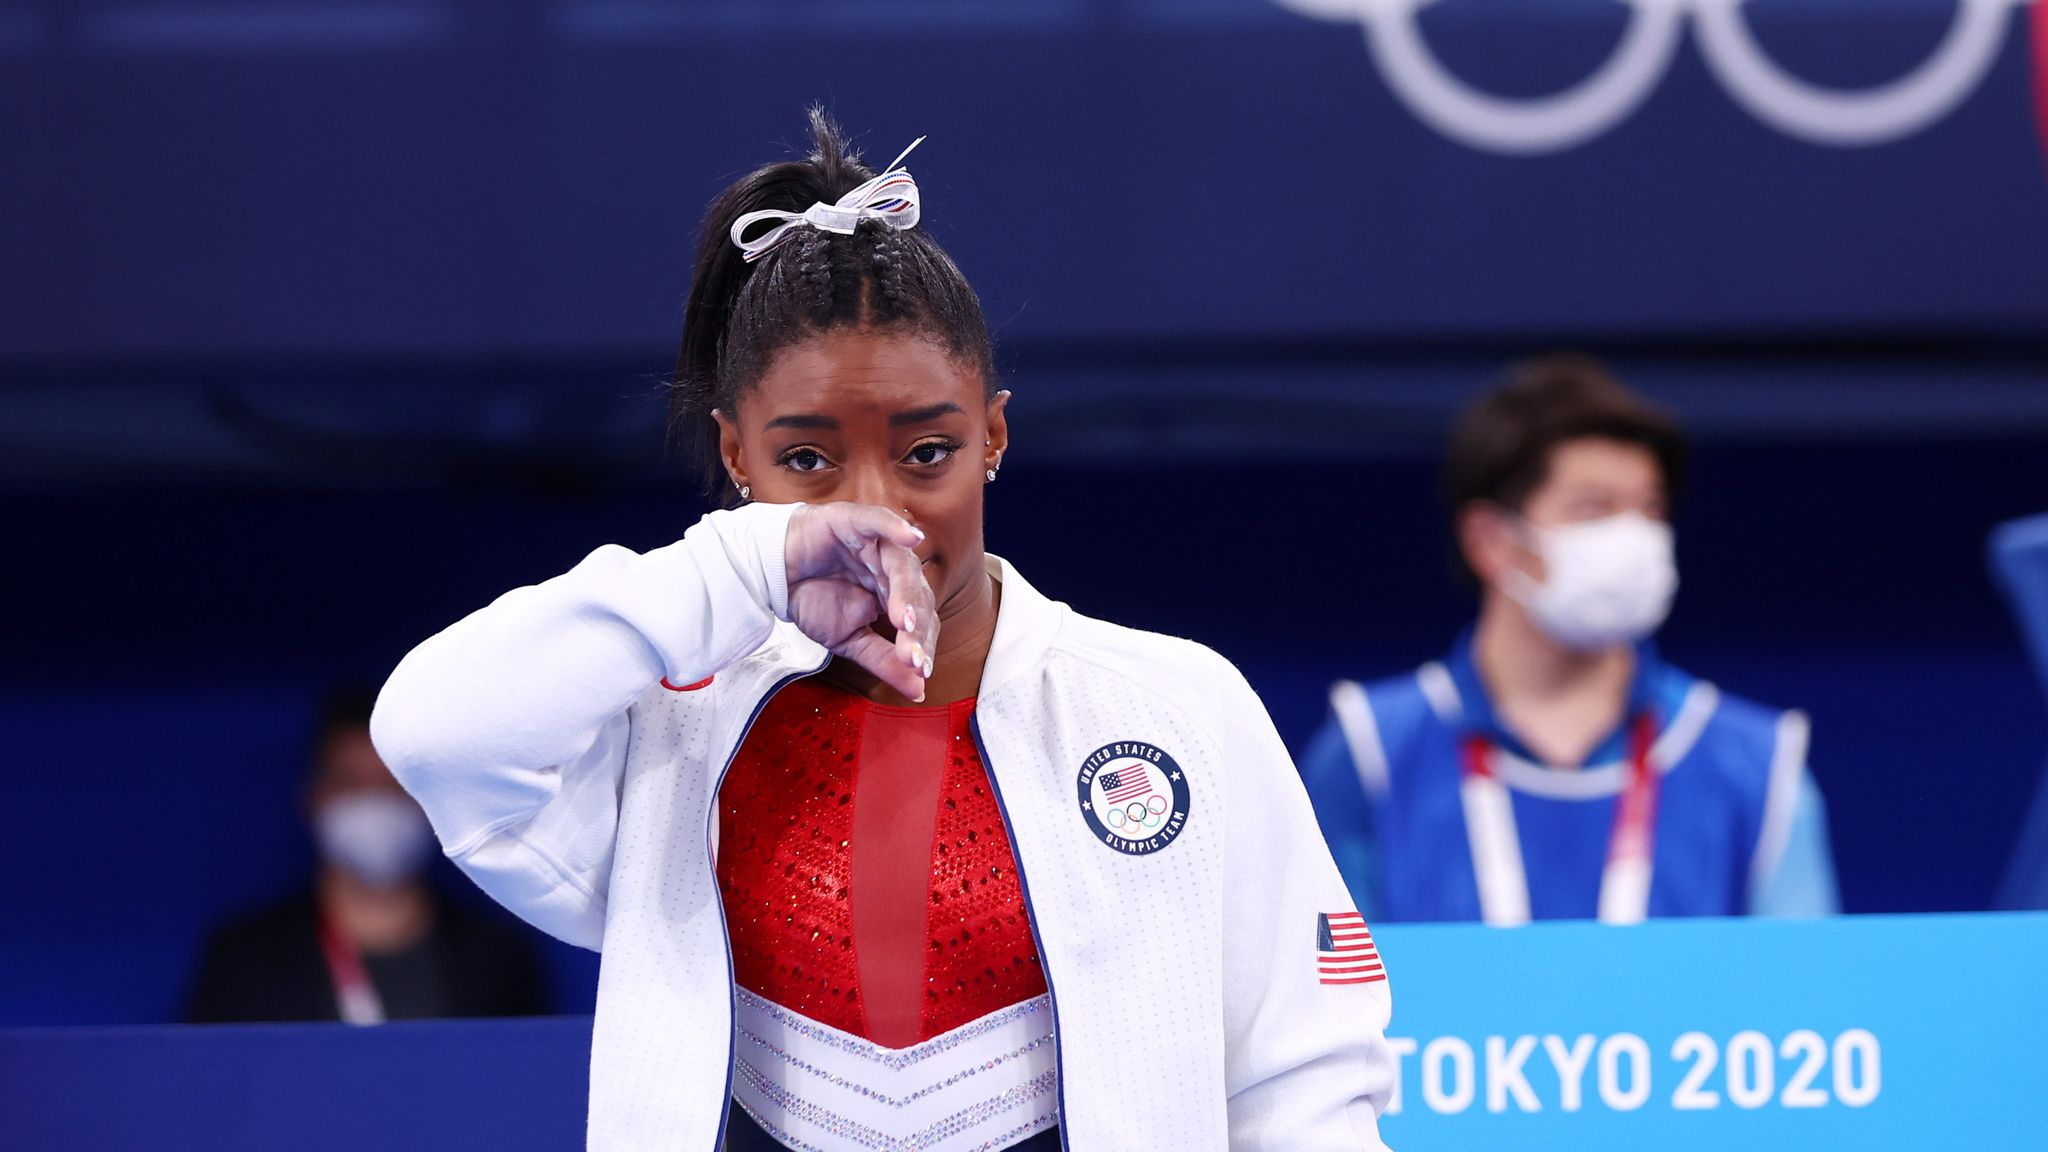 Tokyo Olympics: Simone Biles withdraws from gymnastics team final due to apparent injury   World News   Sky News